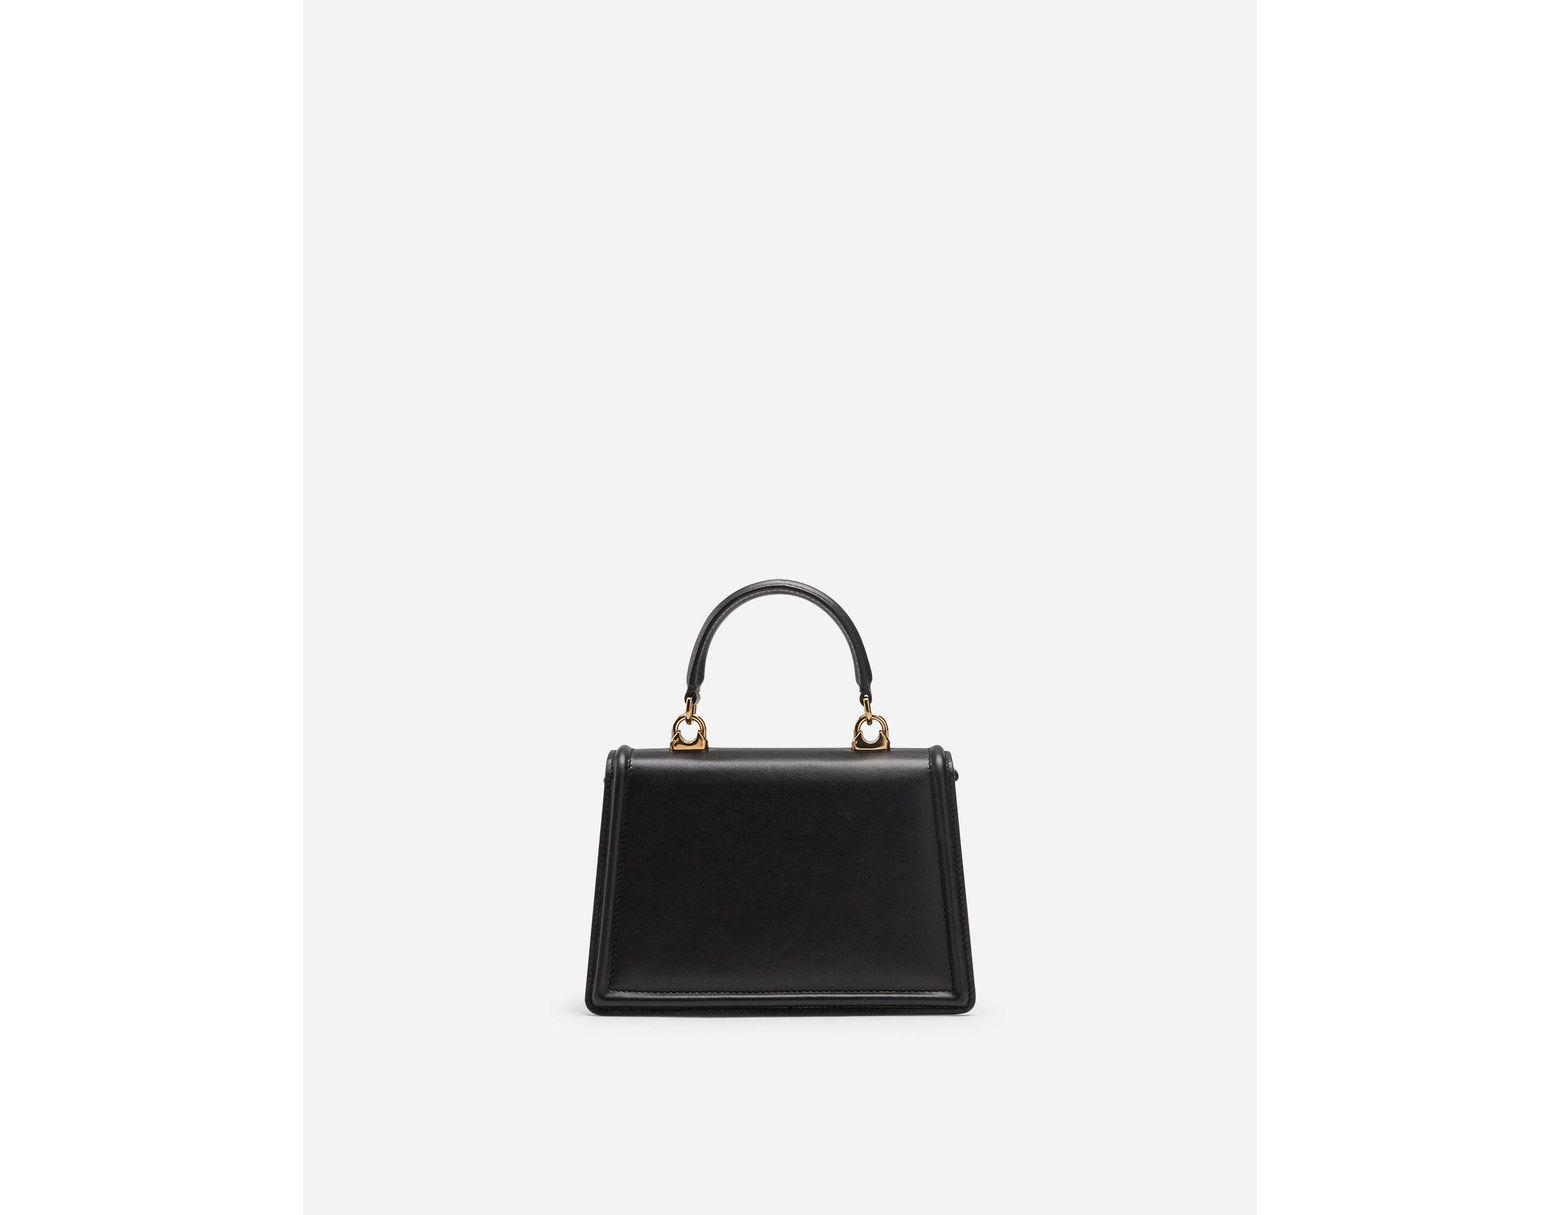 6582a981cee Dolce & Gabbana Small Devotion Bag In Plain Calfskin in Black - Save 30% -  Lyst